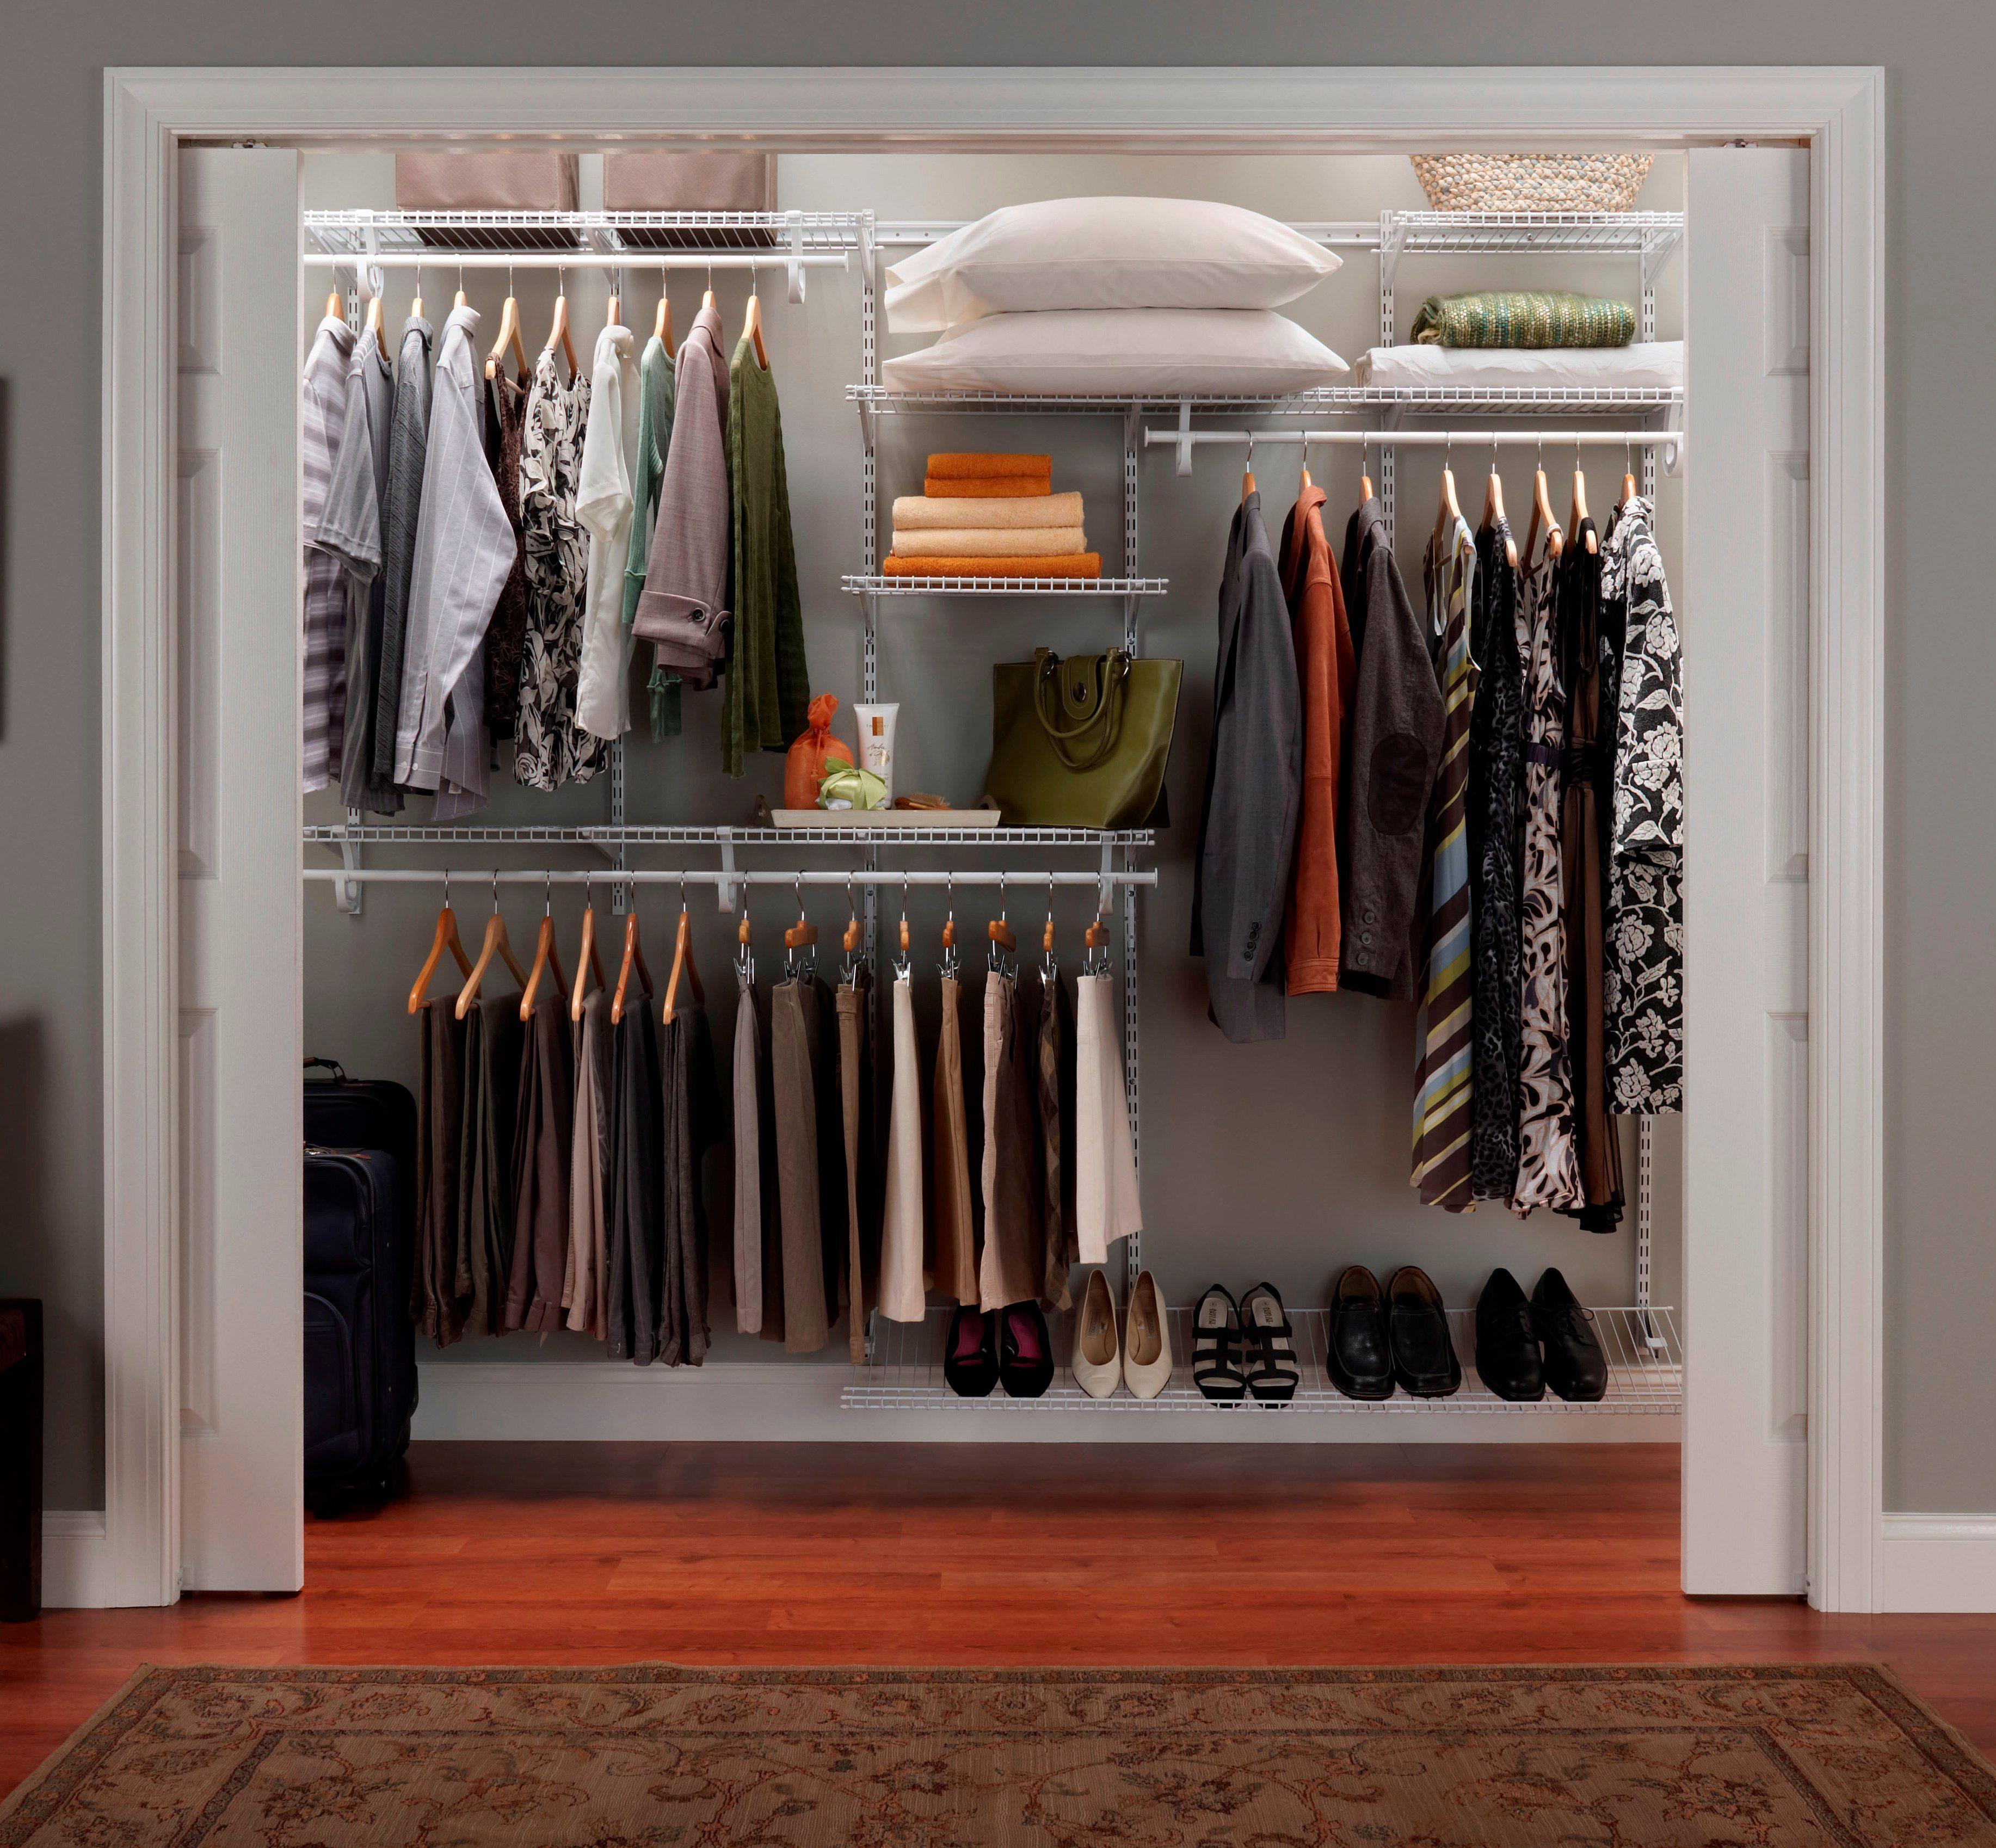 Storganization Blog Responsibly And Locally Made Closet Organizer Kits Home Depot Closet Storage Closet Organization